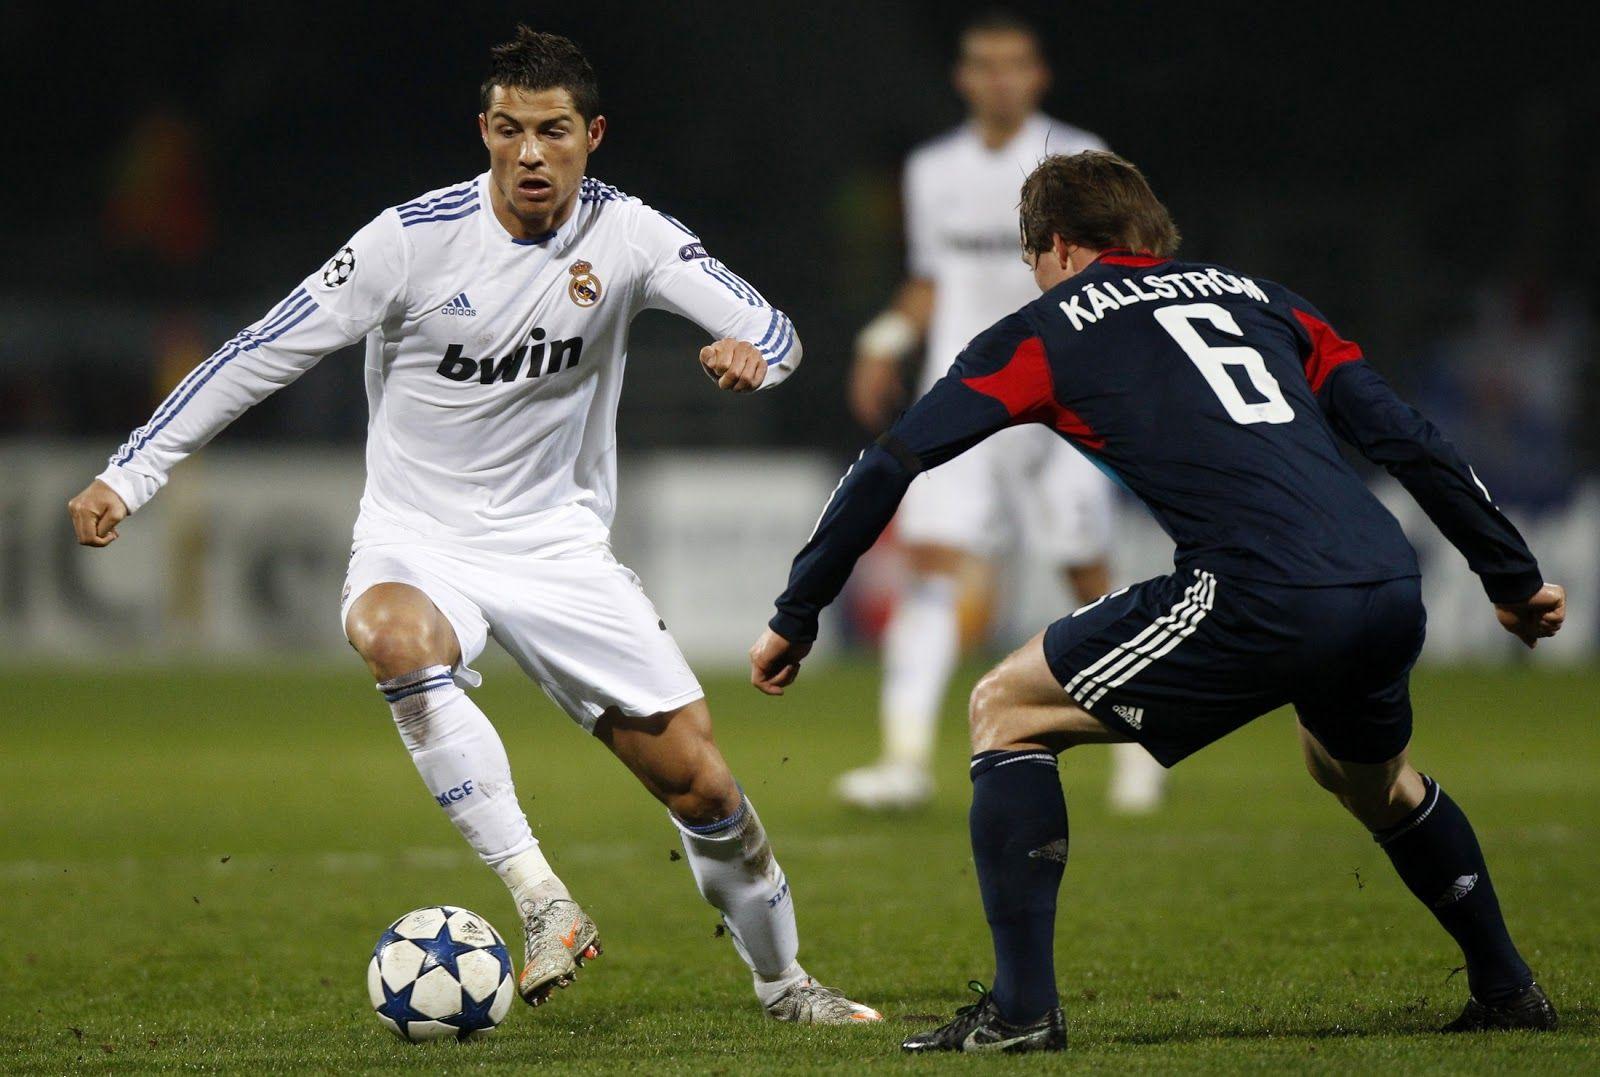 Cristiano Ronaldo SOCCER IS A KICK ASS SPORT... SPORTS